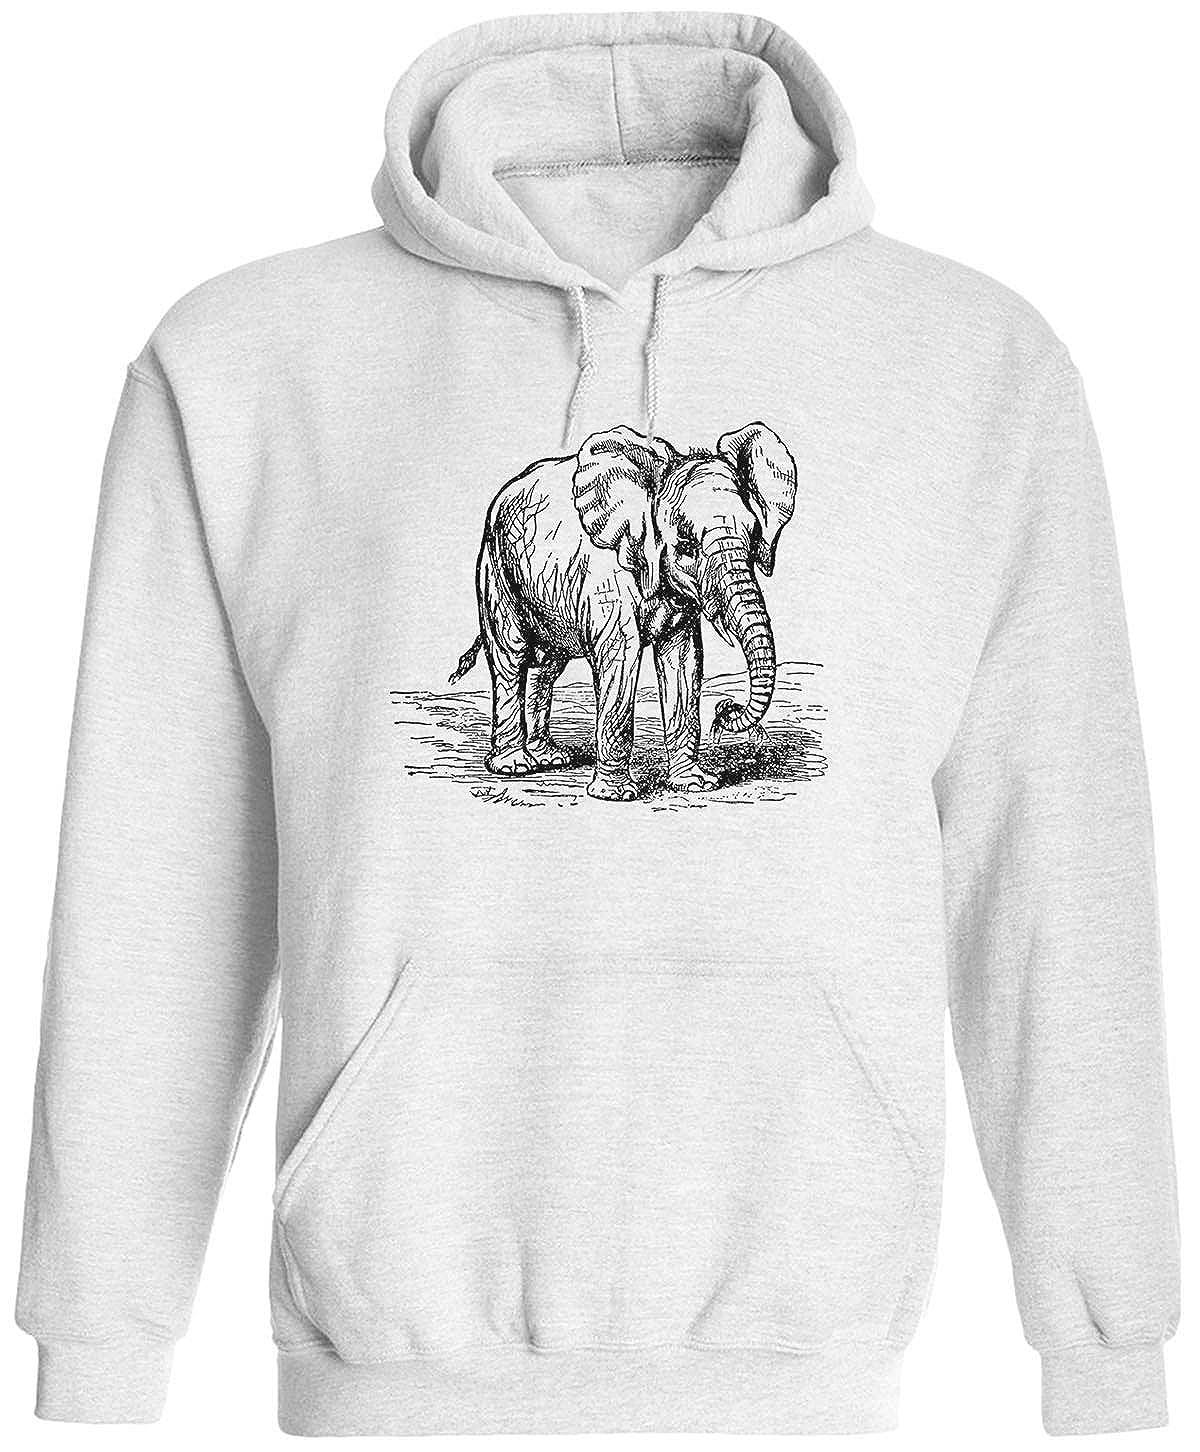 Austin Ink Apparel Wrinkled Old Elephant Unisex Adult Hooded Pullover Sweatshirt